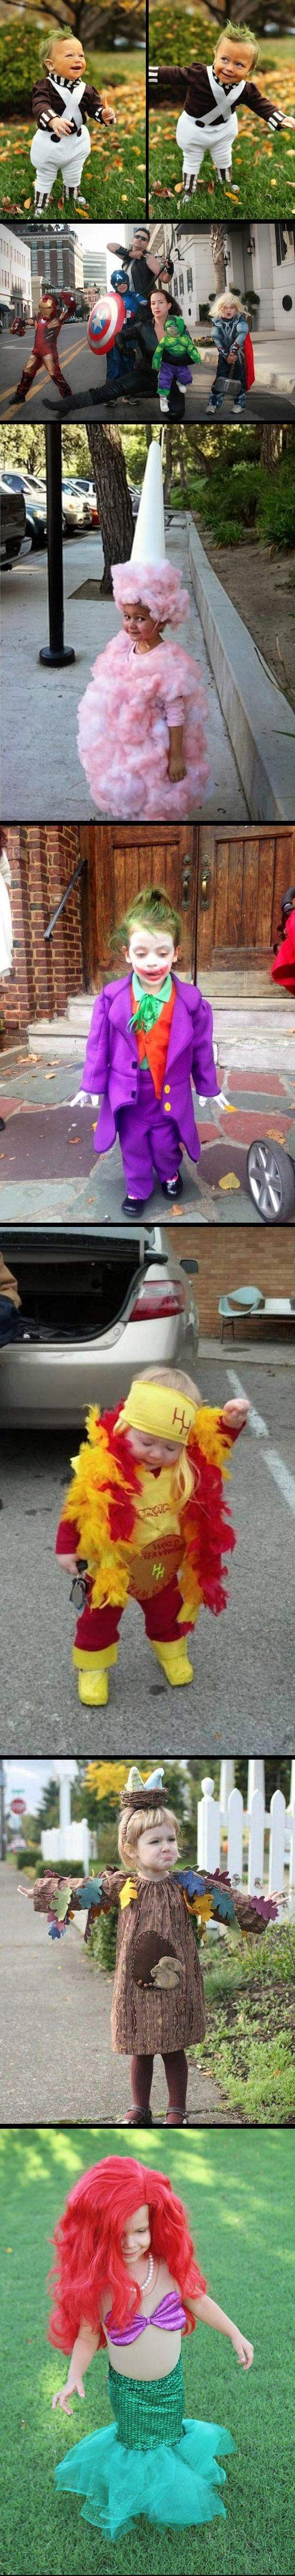 funny-kids-Halloween-costumes